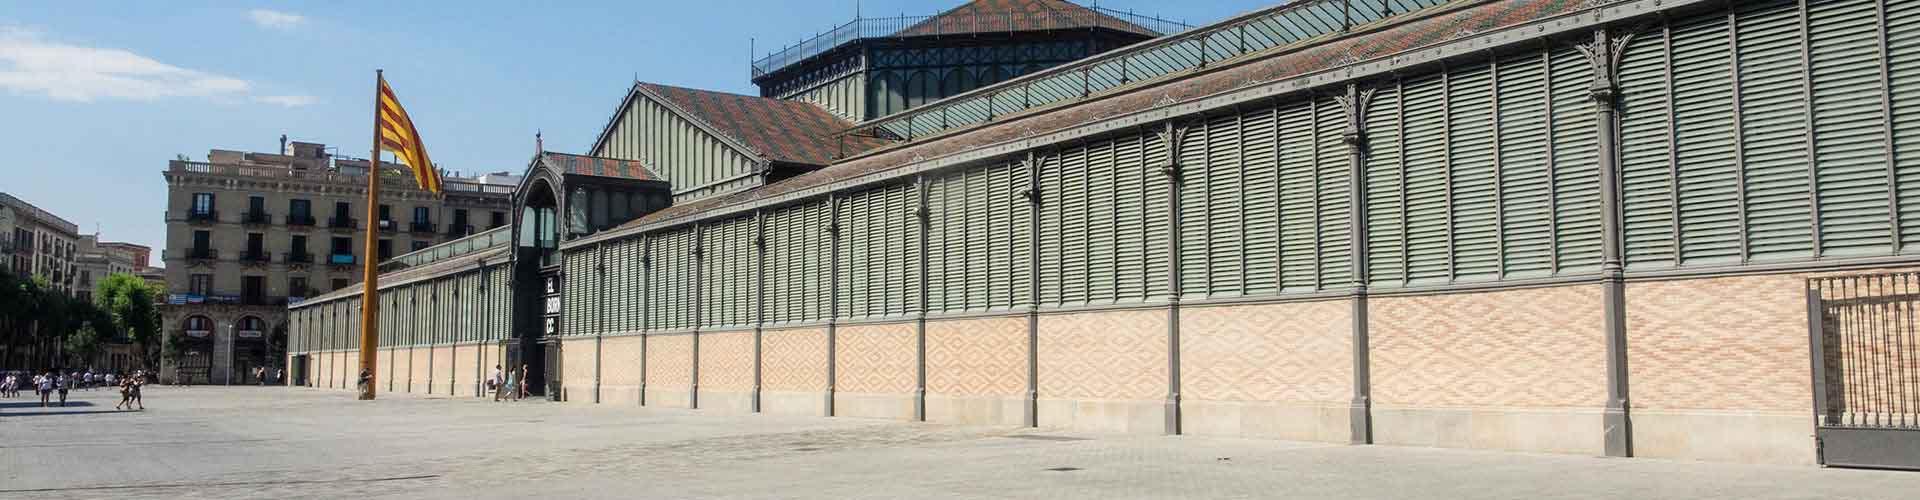 Barcellona ostelli ostelli for Ostelli a barcellona consigli